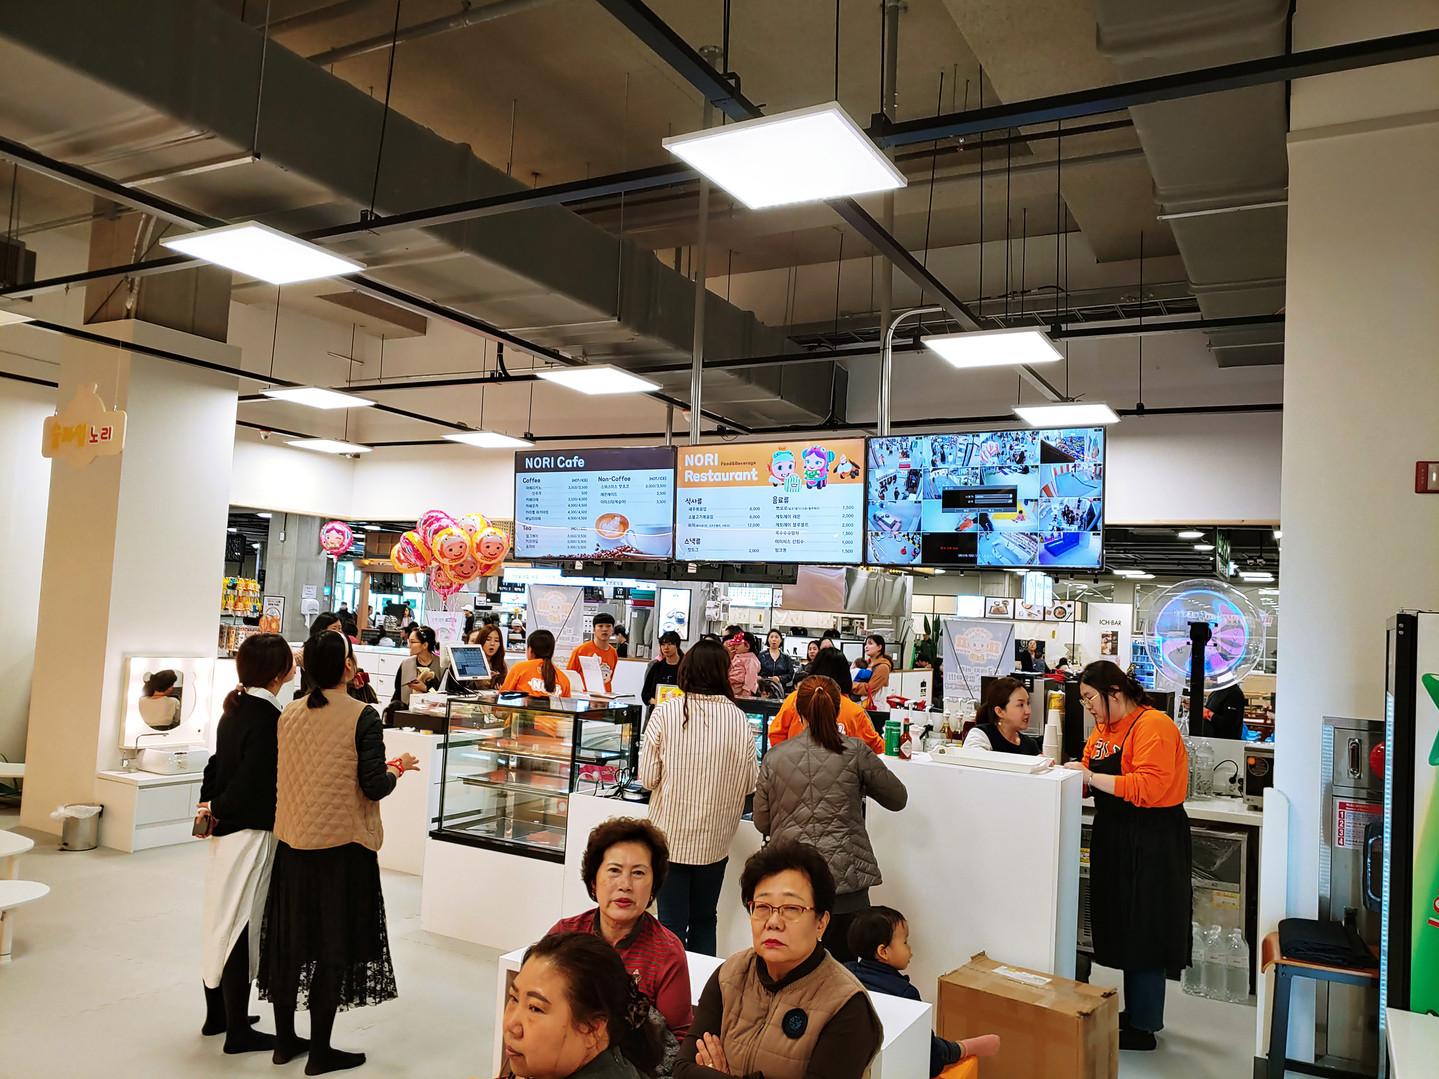 Nori Digital Kids Cafe, Lotte Mart, Icheon, Korea